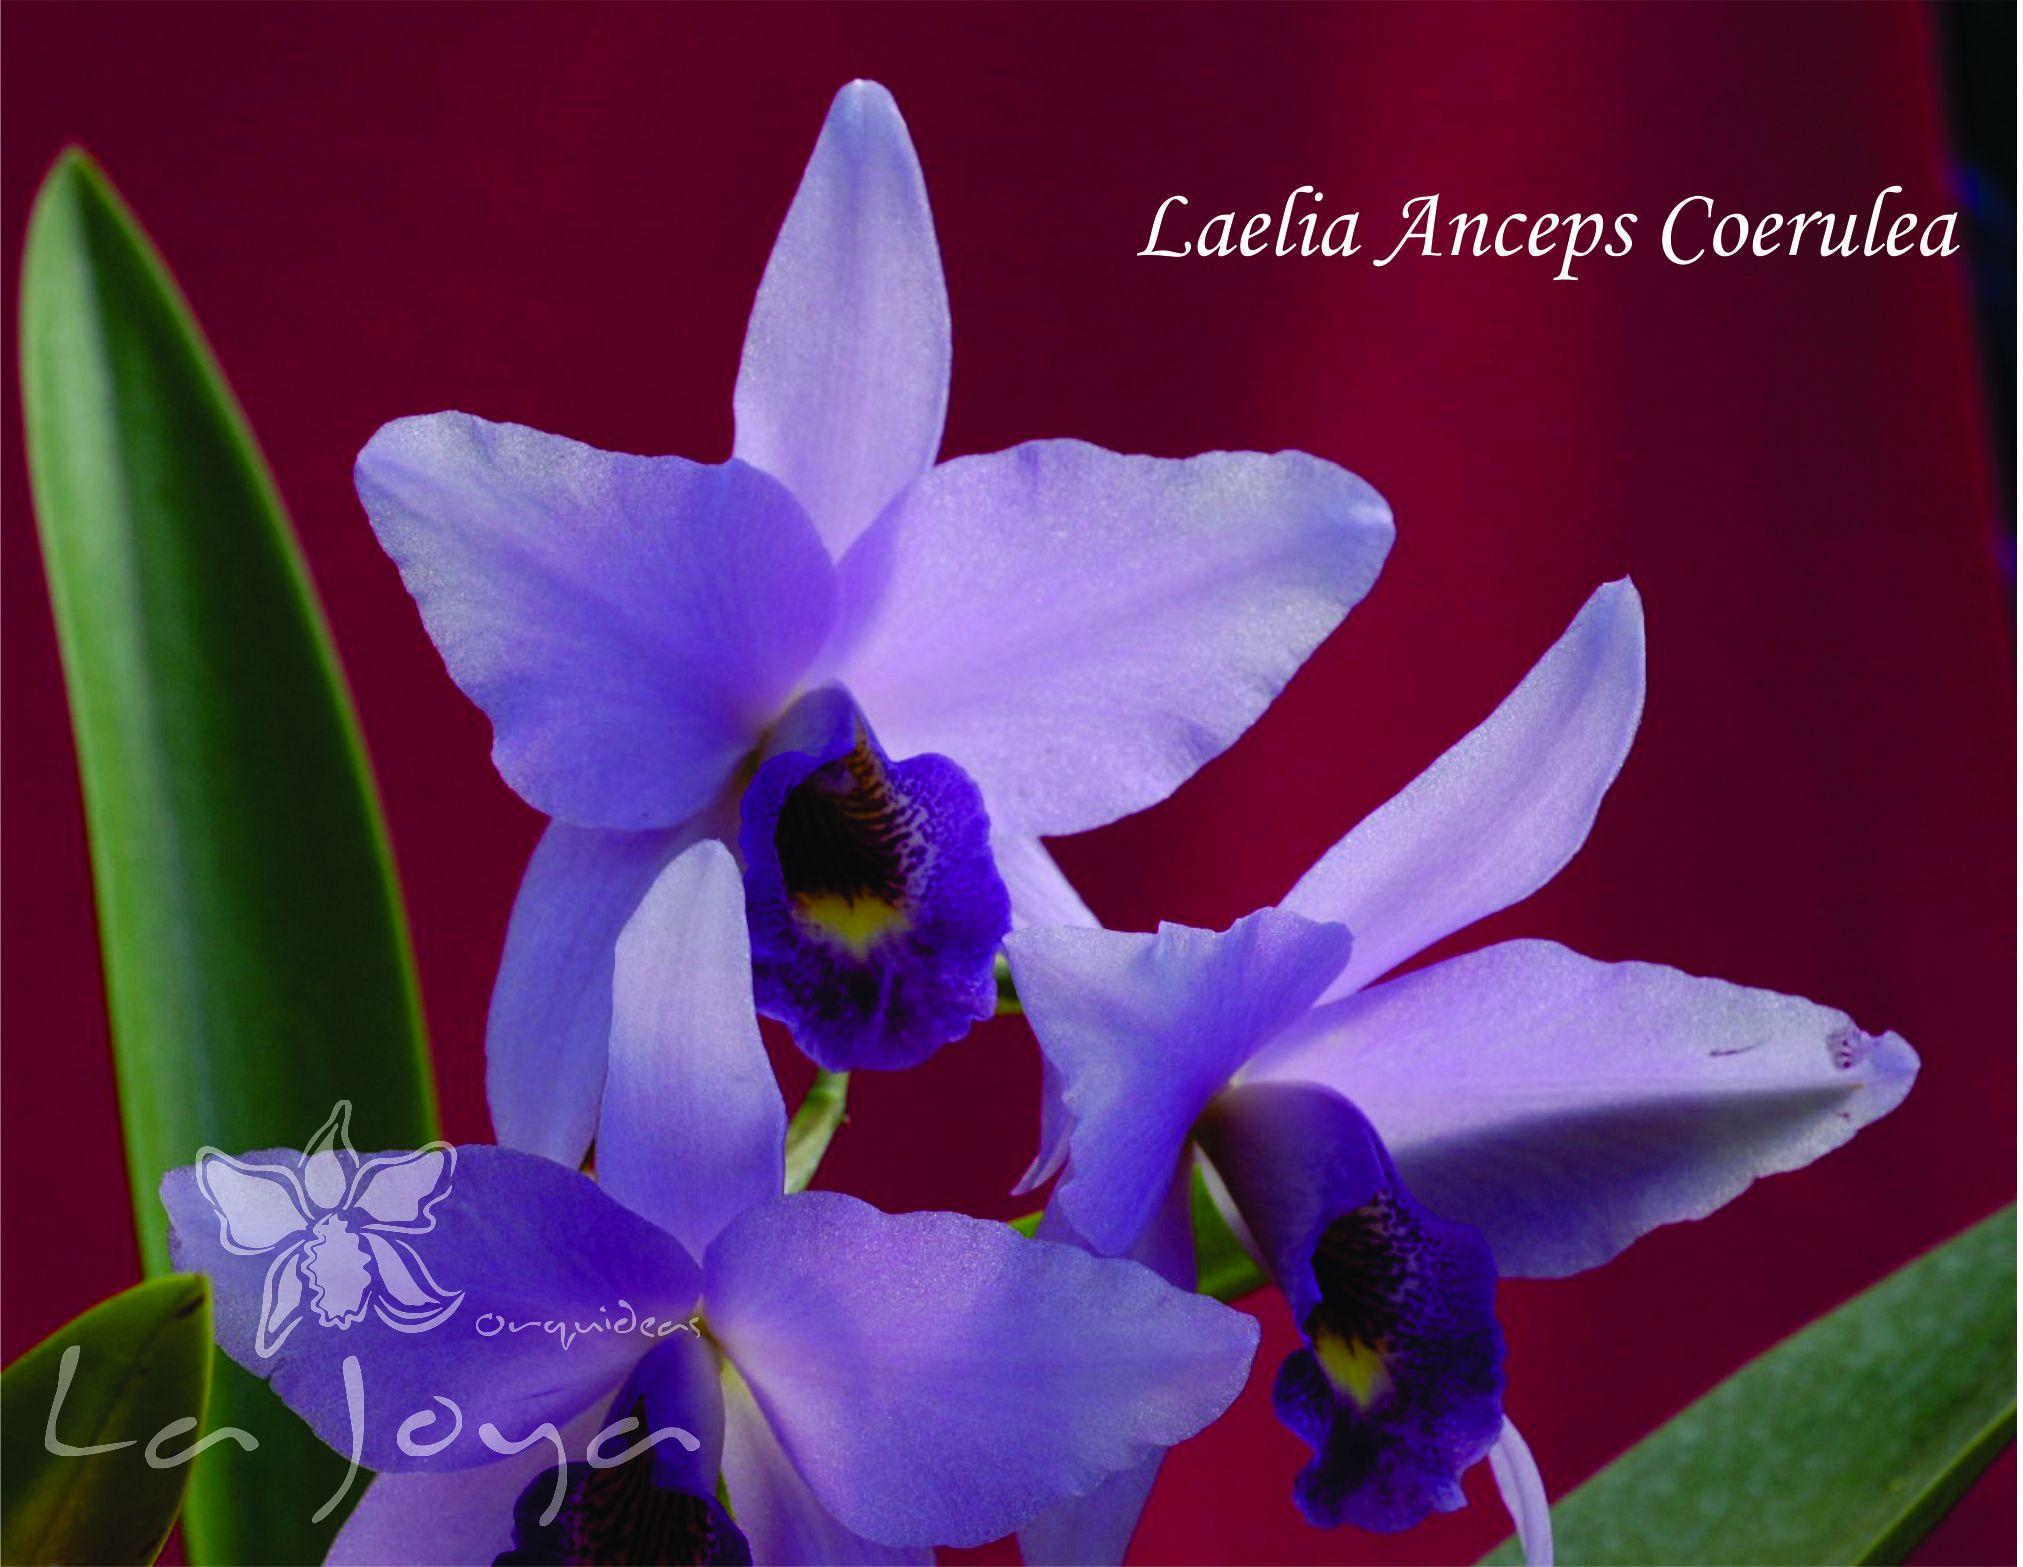 Laelia Anceps Coerulea